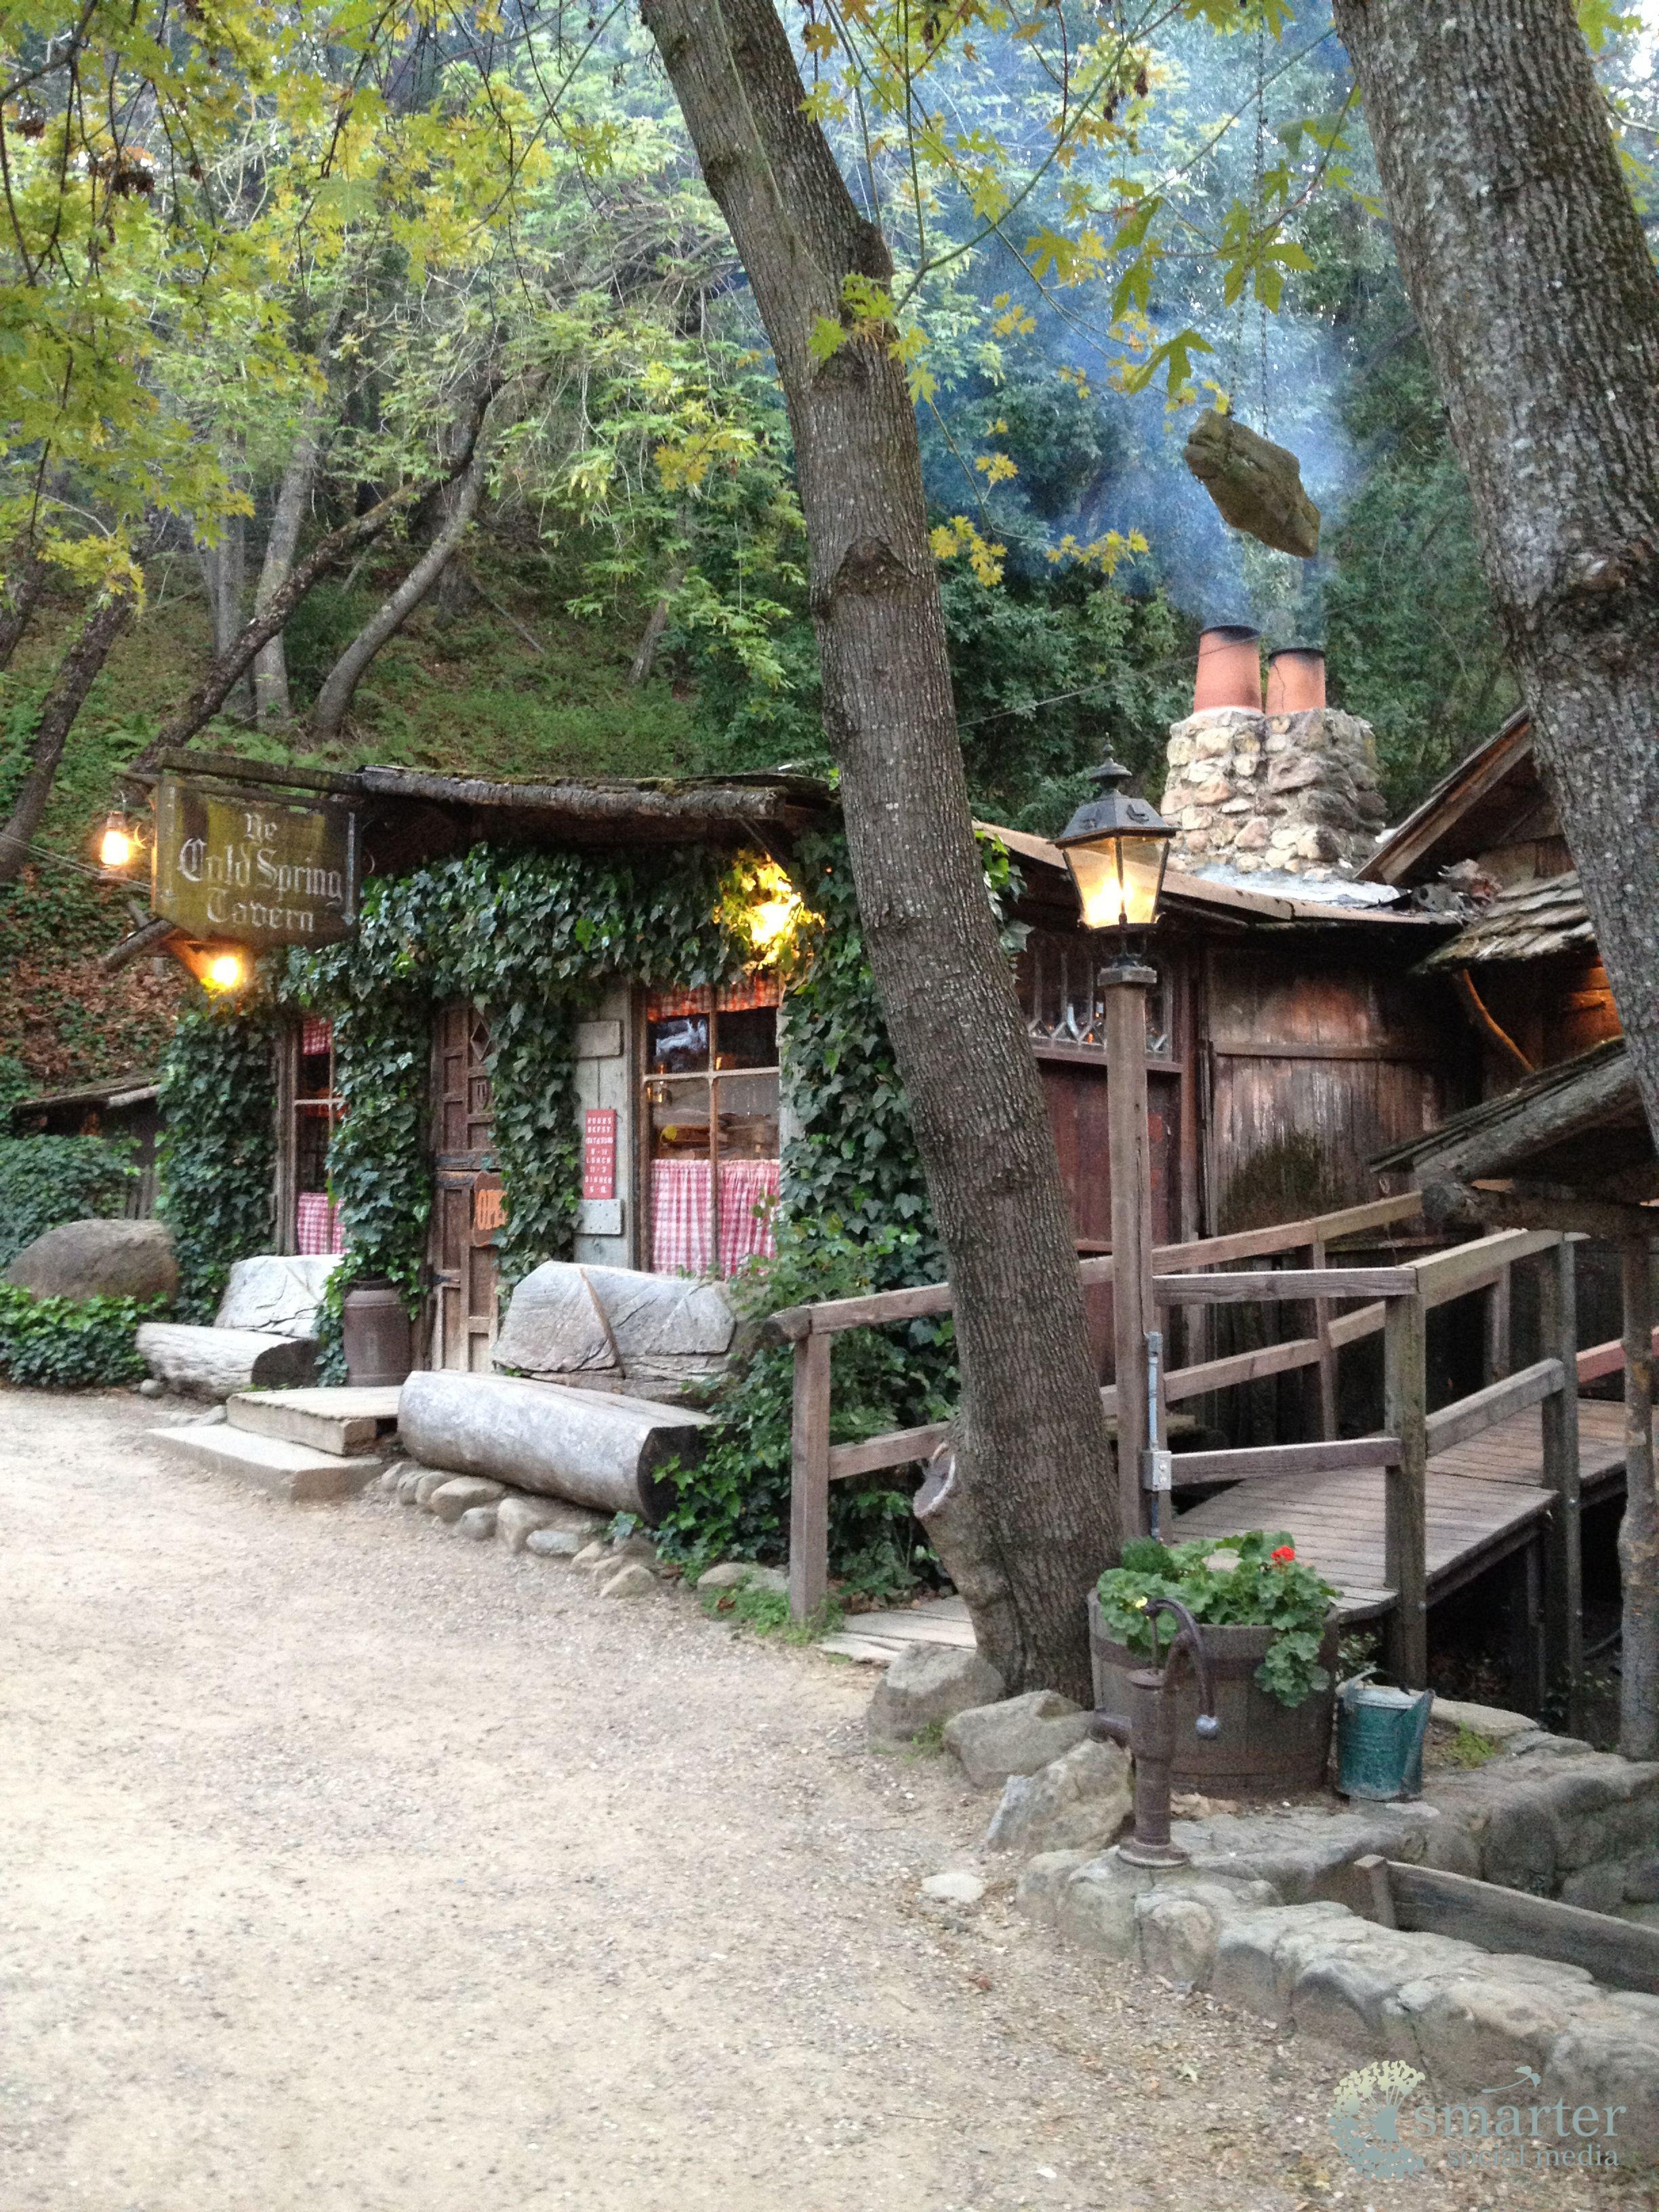 Cold spring tavern in the mountains of santa barbara